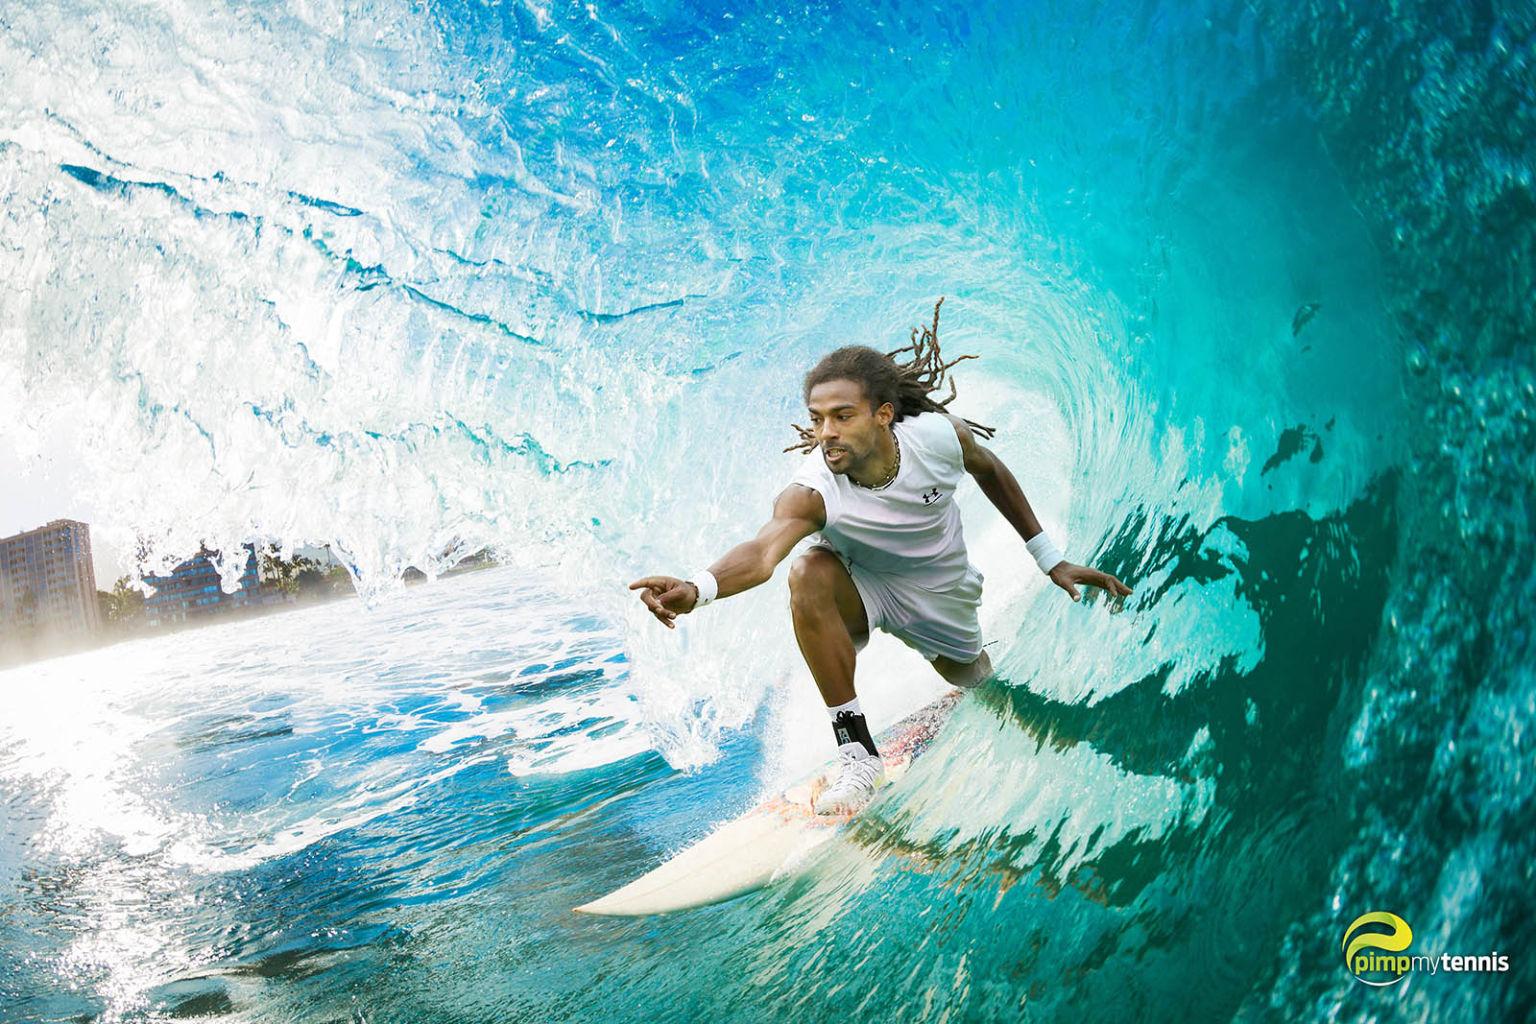 Dustin.Brown_High.on.the.wave_Rastapower_M.jpg http://pimpmytennis.com/dustin-brown-high-wave/